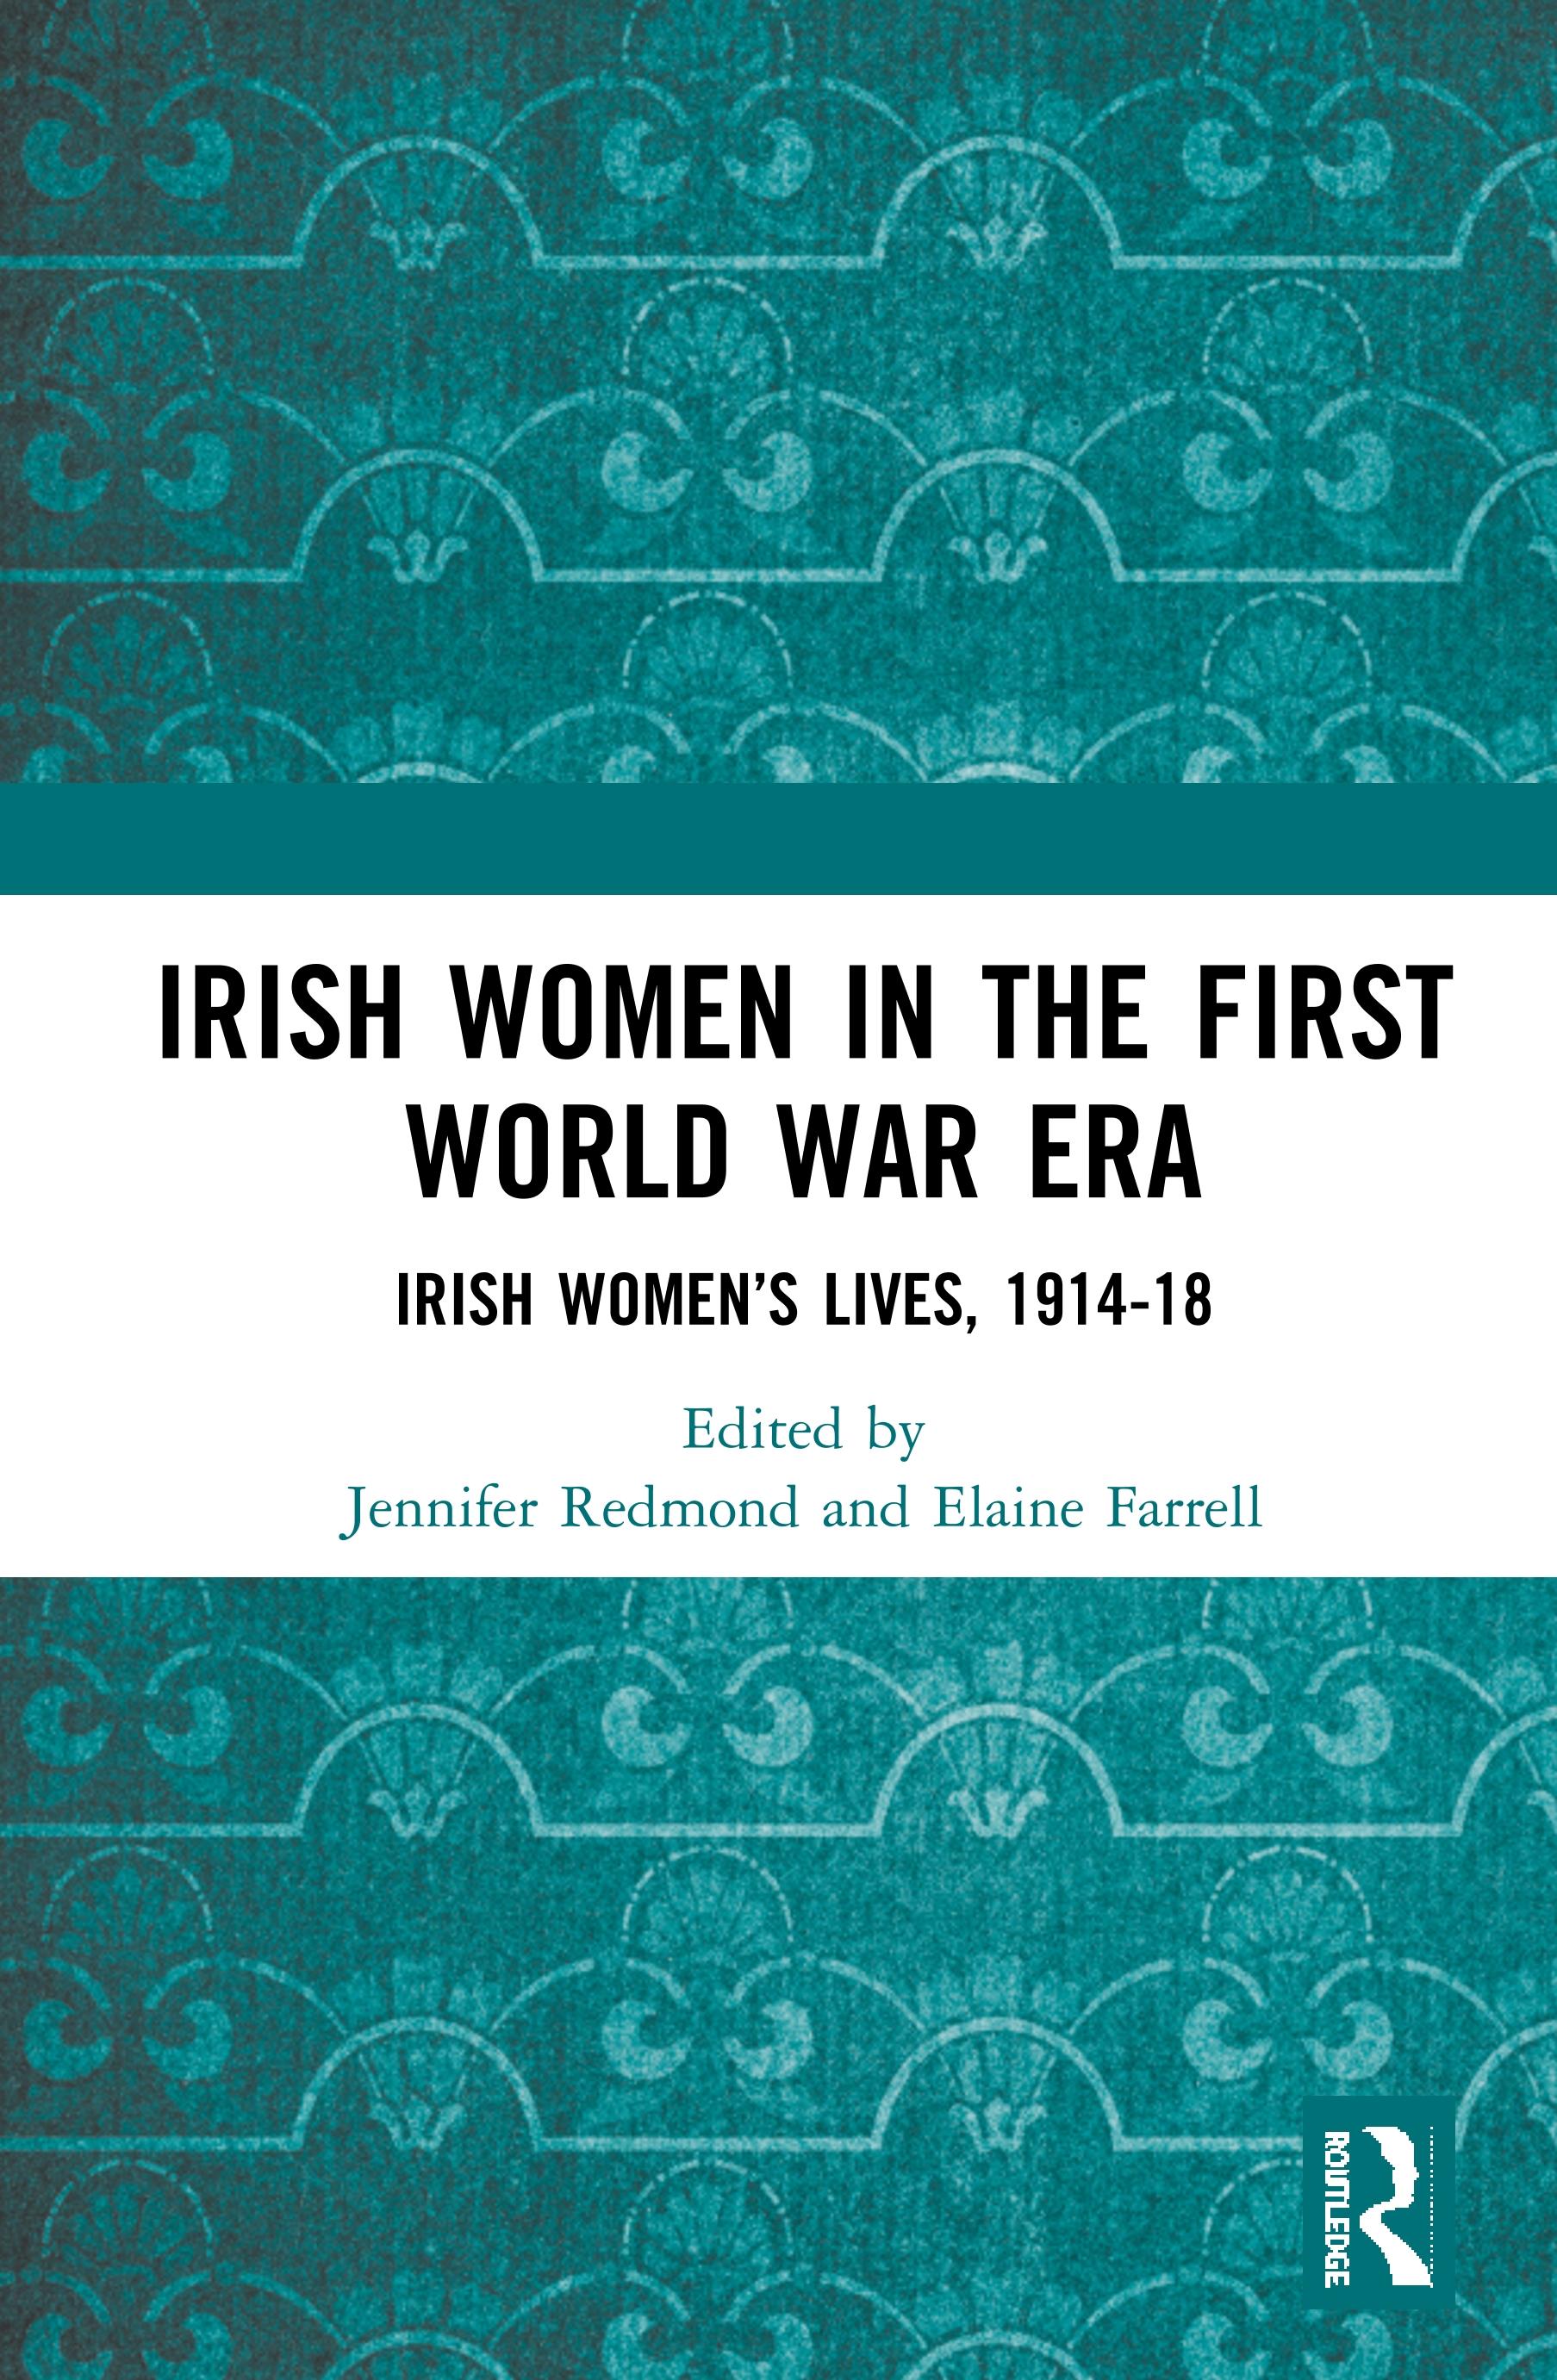 Irish Women in the First World War Era: Irish Women's Lives, 1914-18 book cover